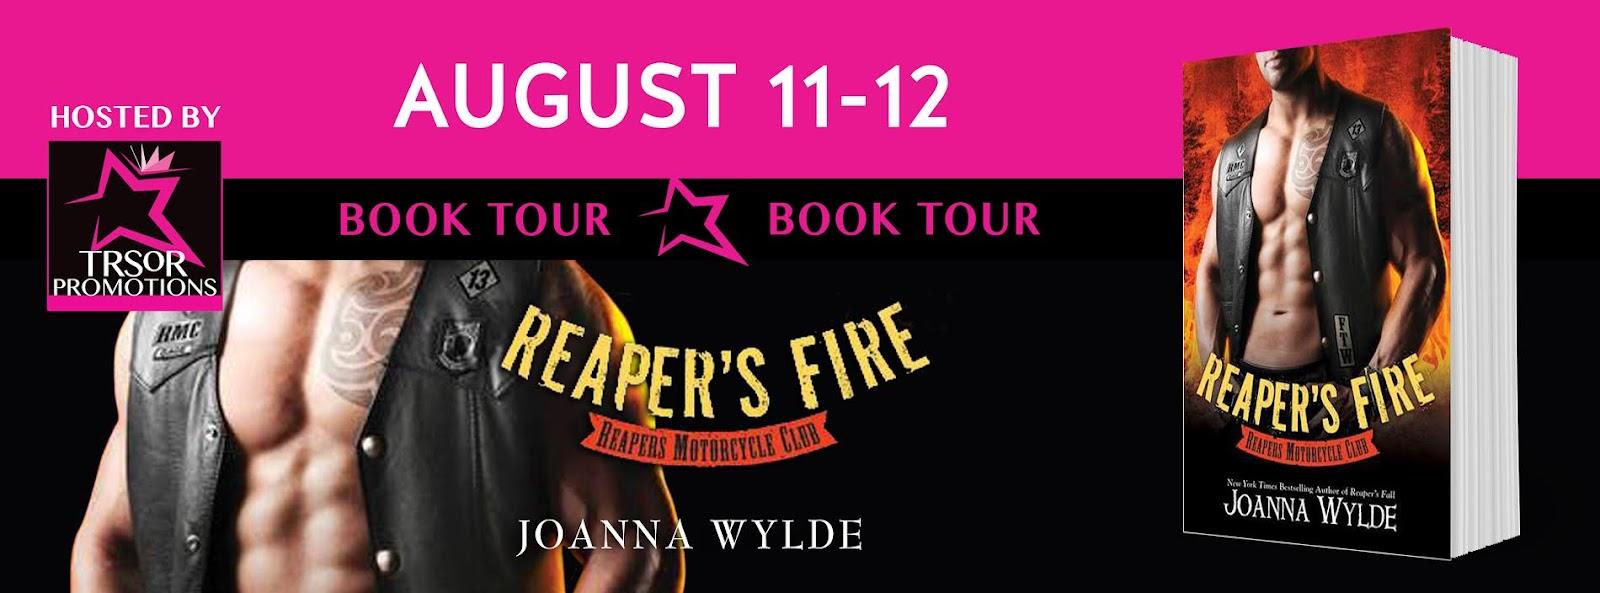 reaper's fire book tour.jpg